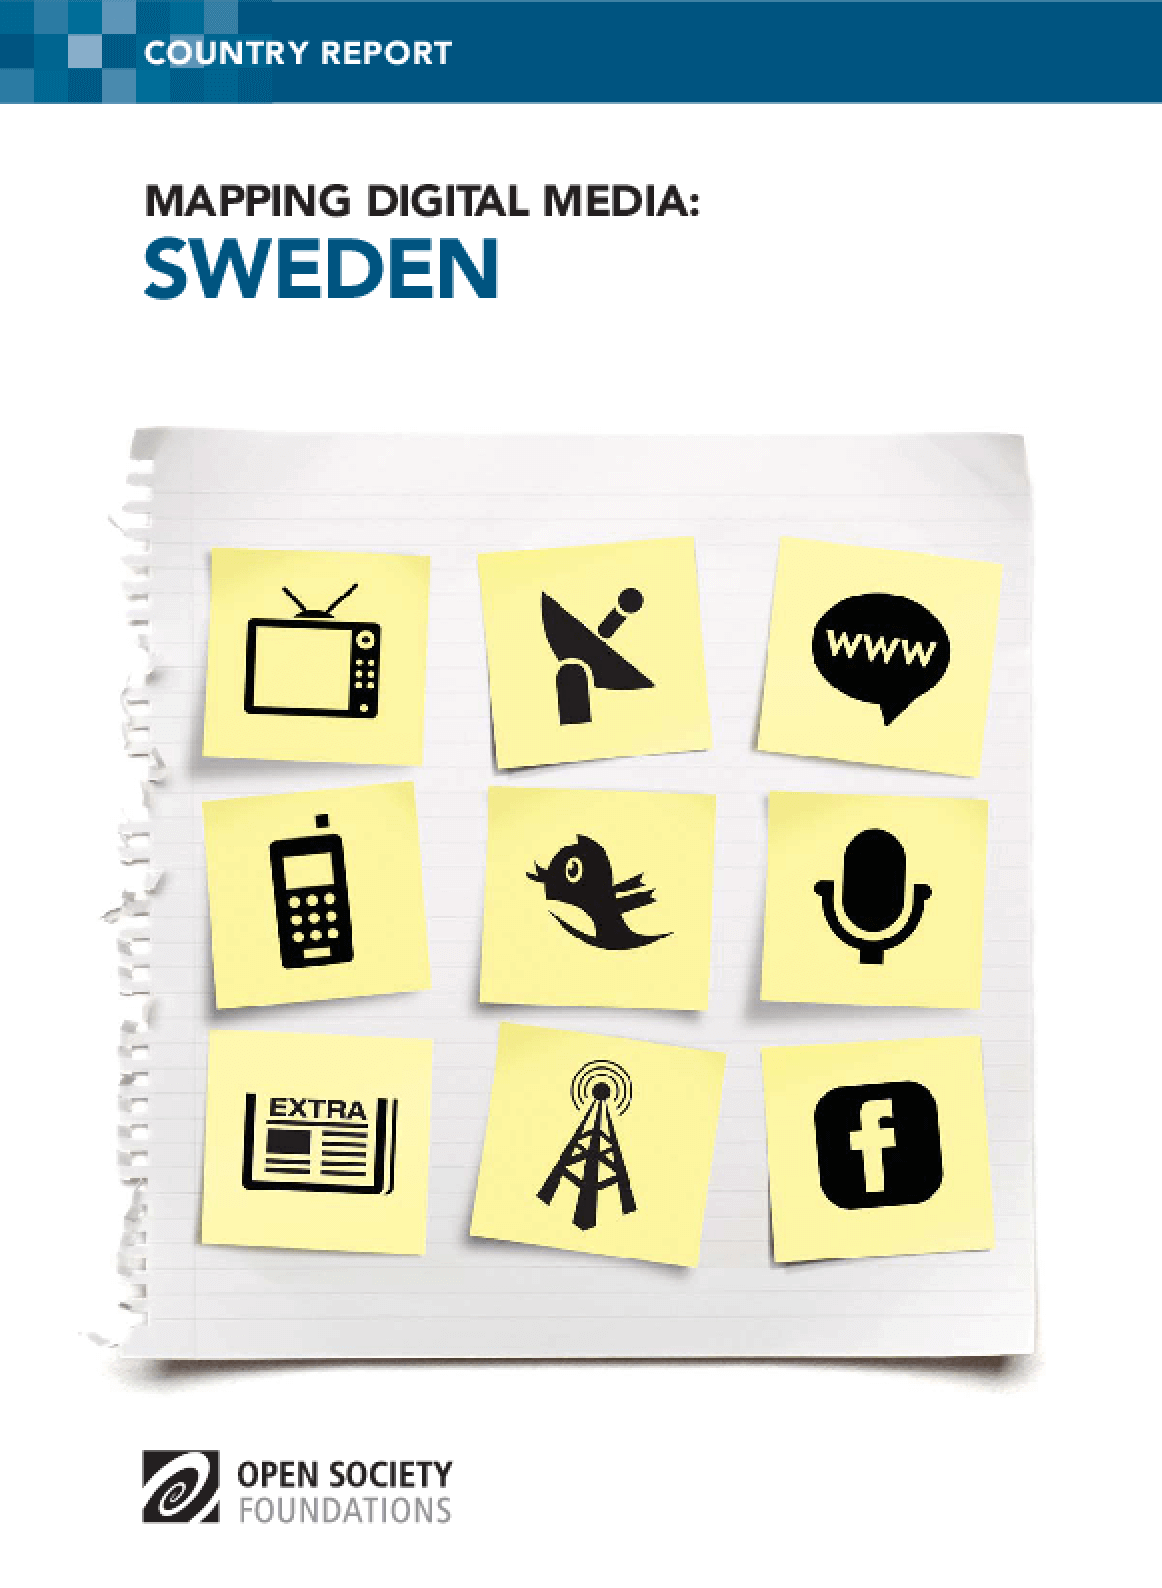 Mapping Digital Media: Sweden